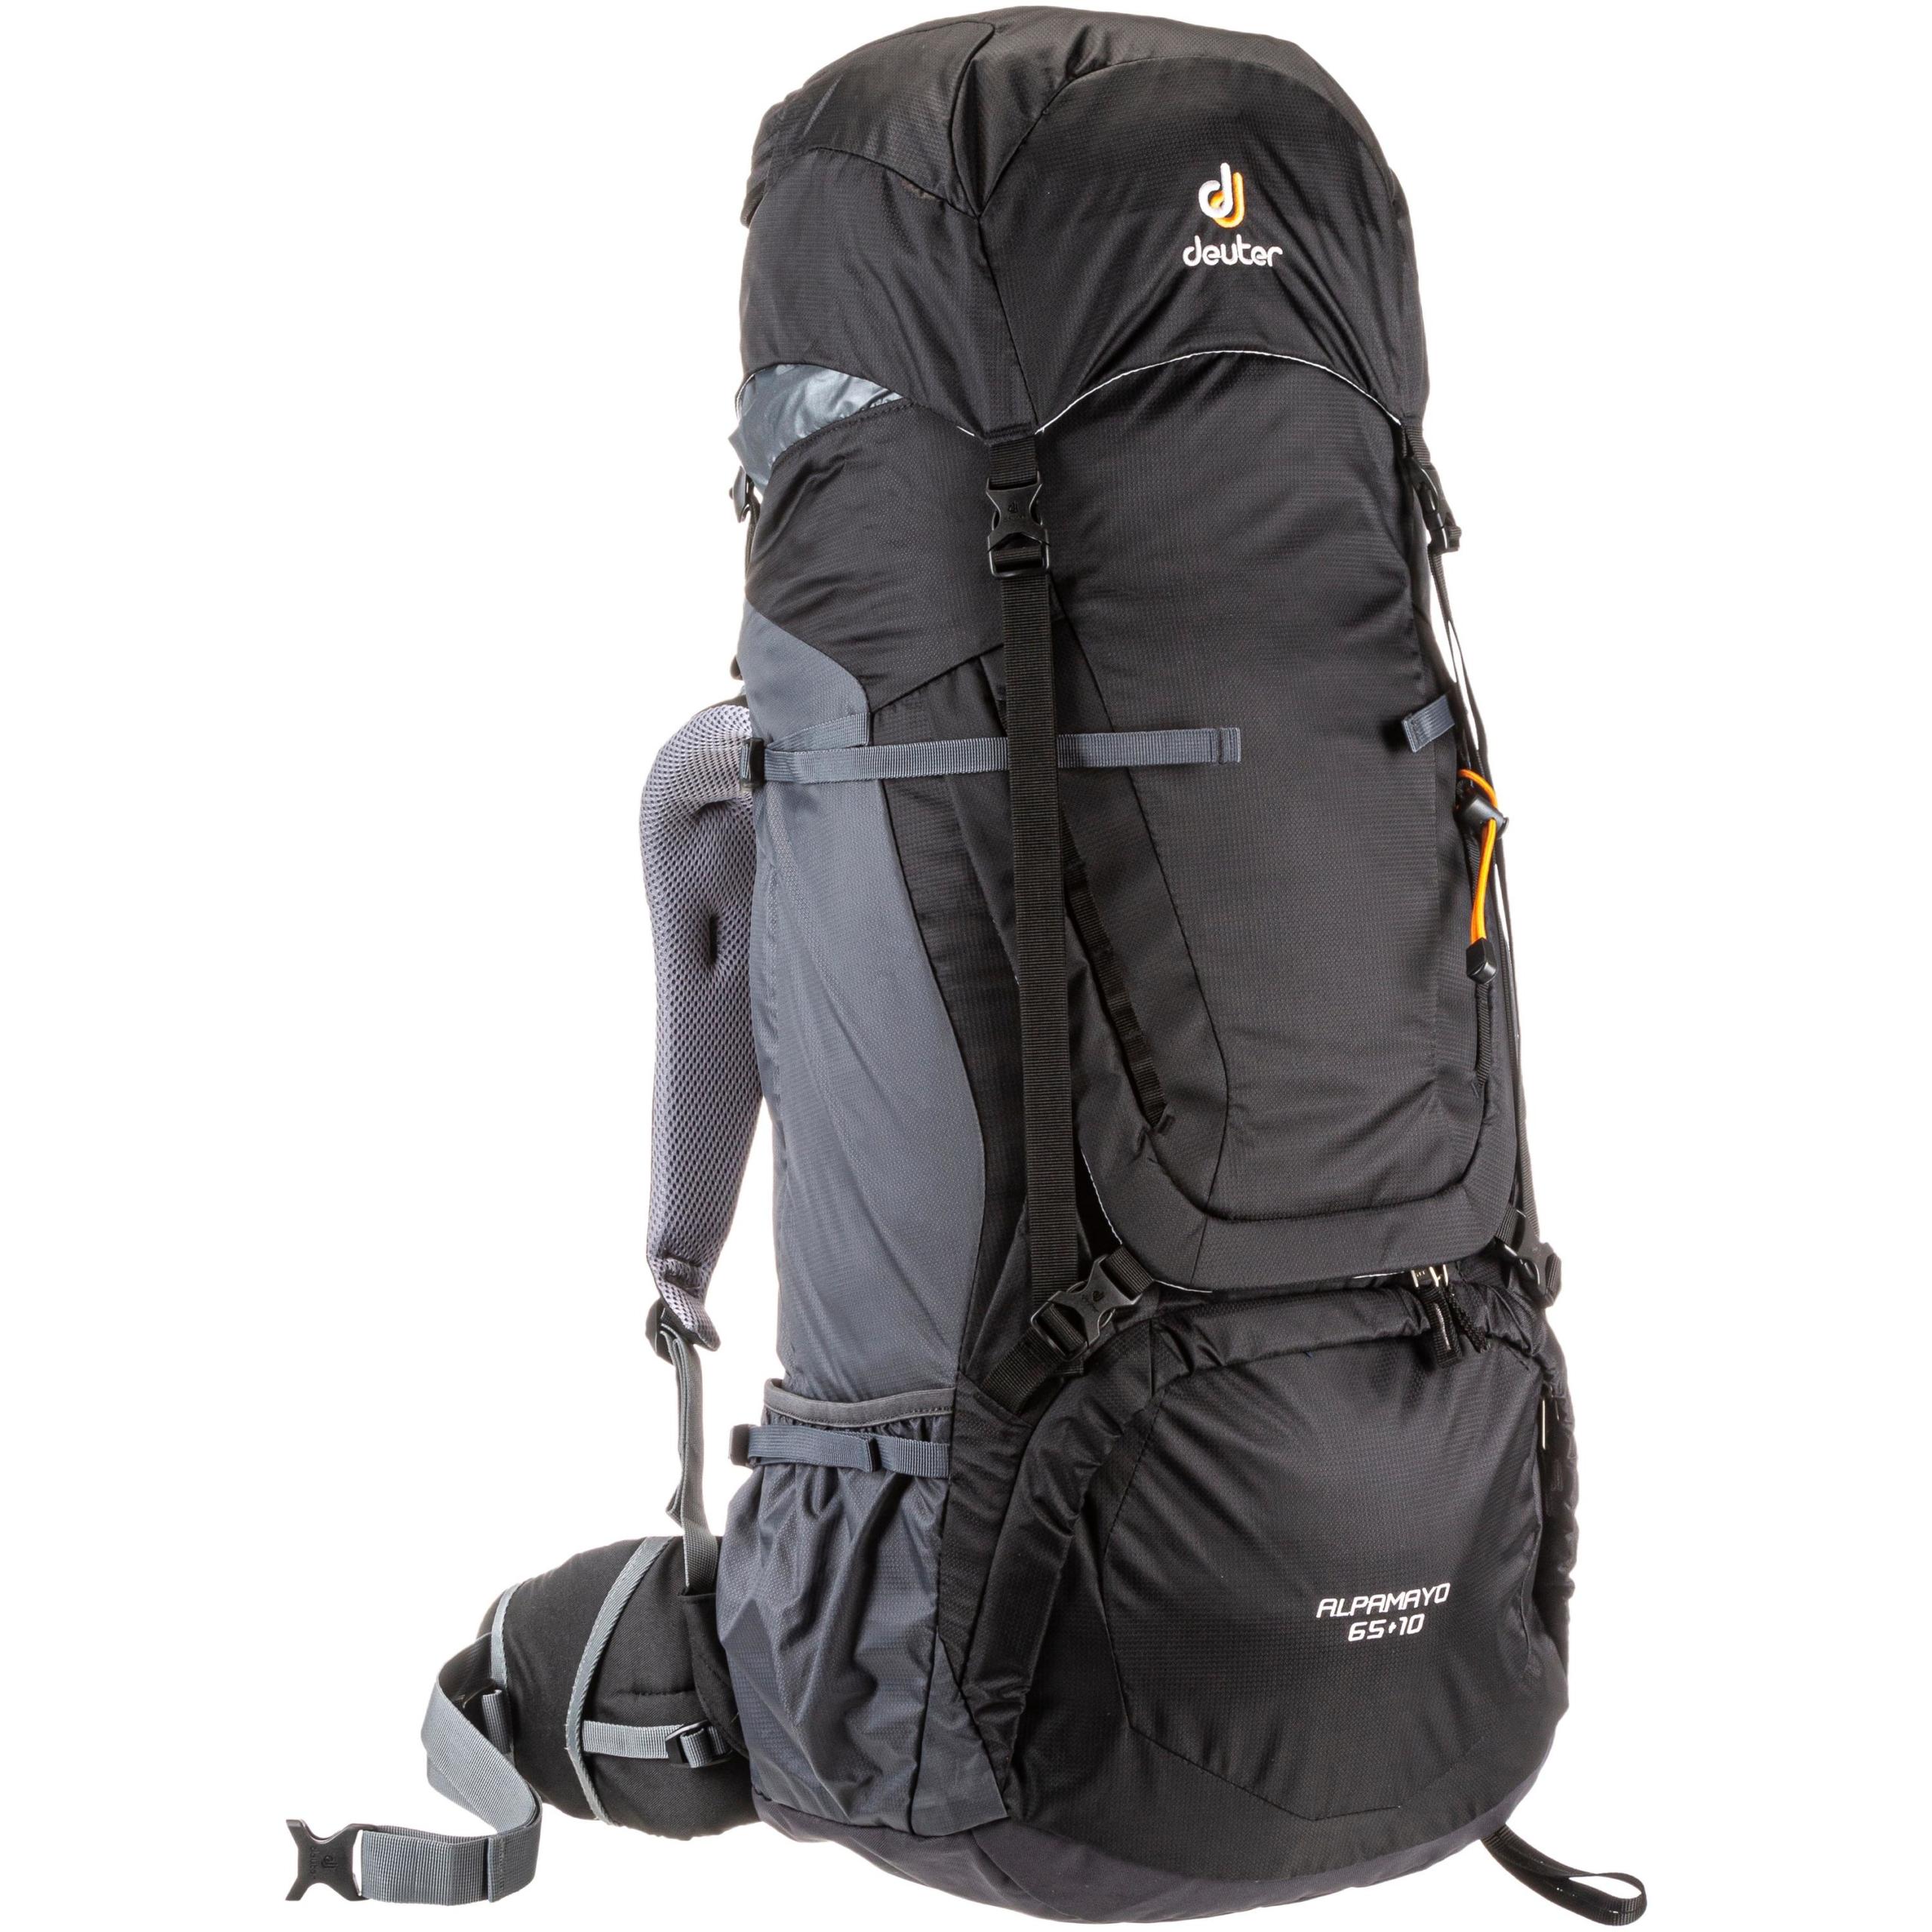 Deuter Alpamayo 65 + 10 Trekkingrucksack